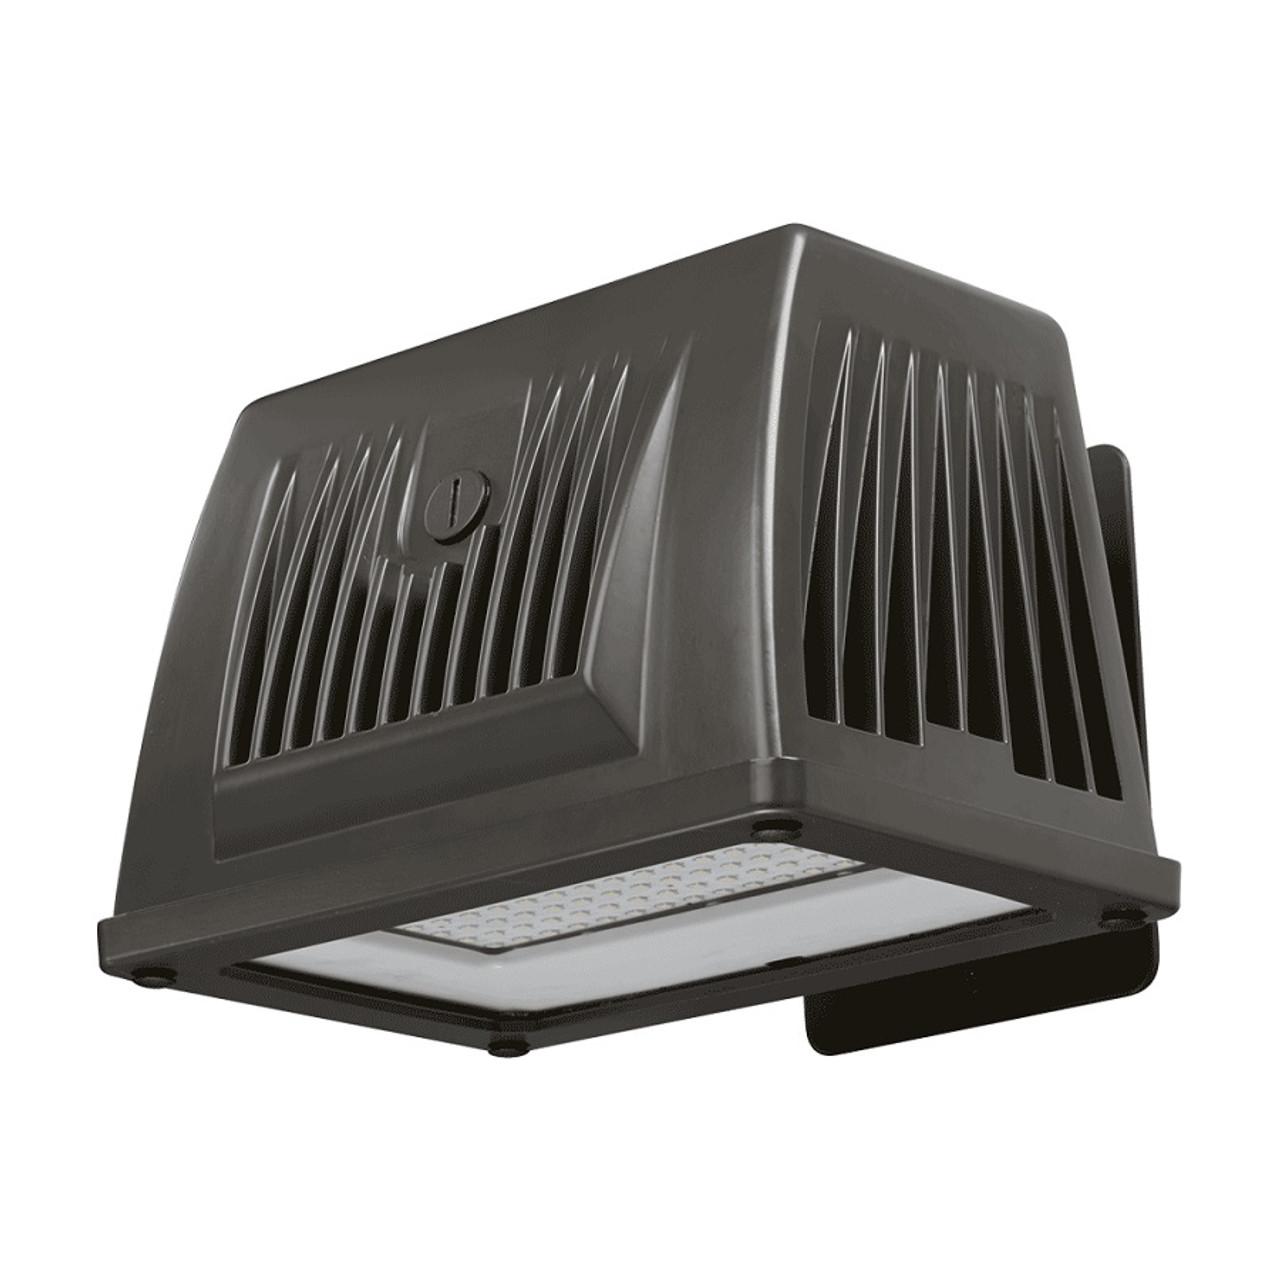 Atlas WPM64LED 64 Watt LED Wall Light